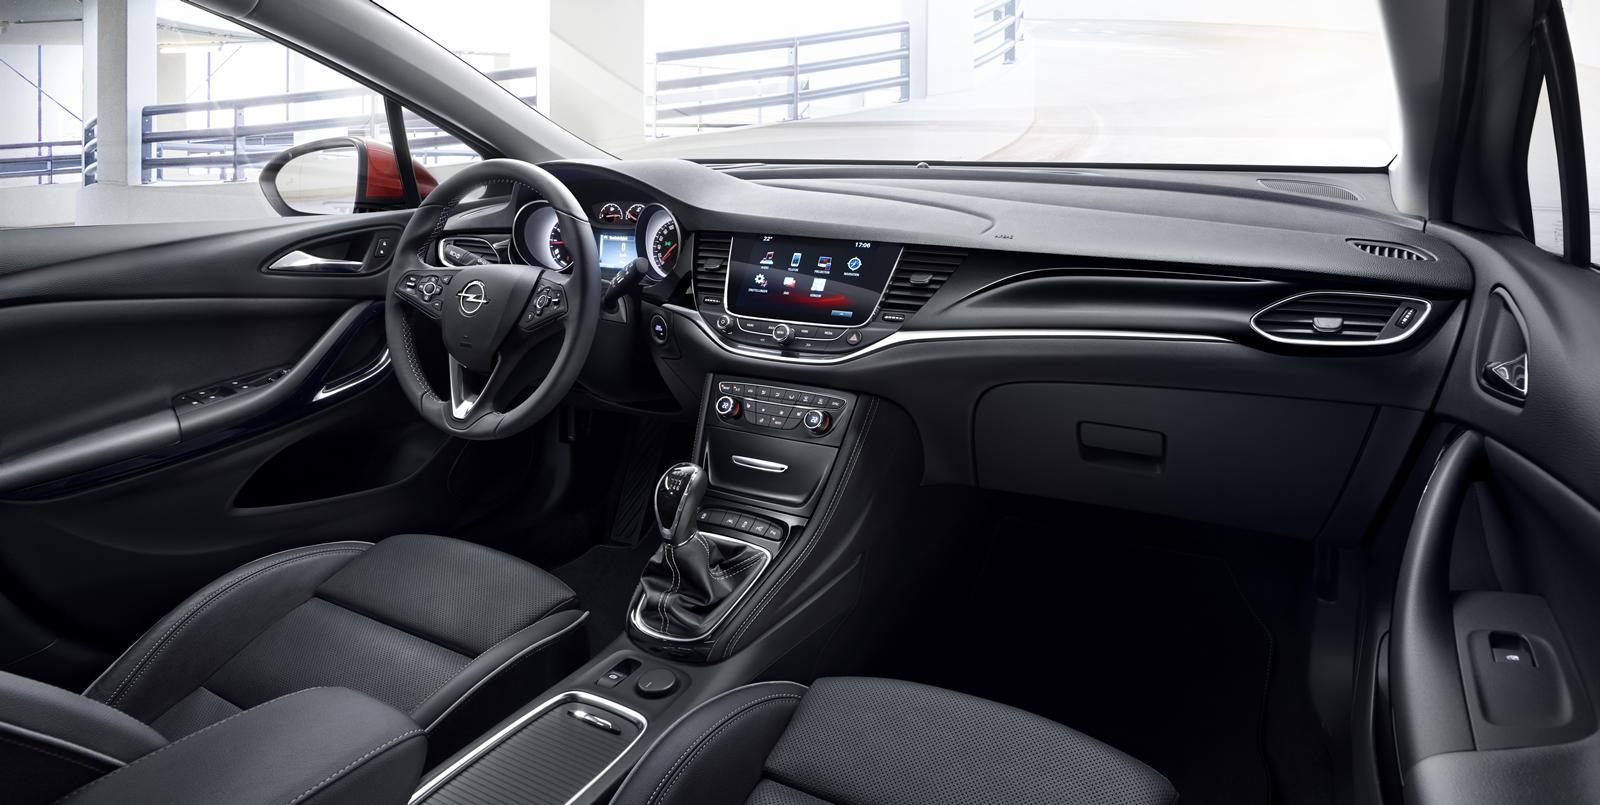 Opel Astra 2016 (6)